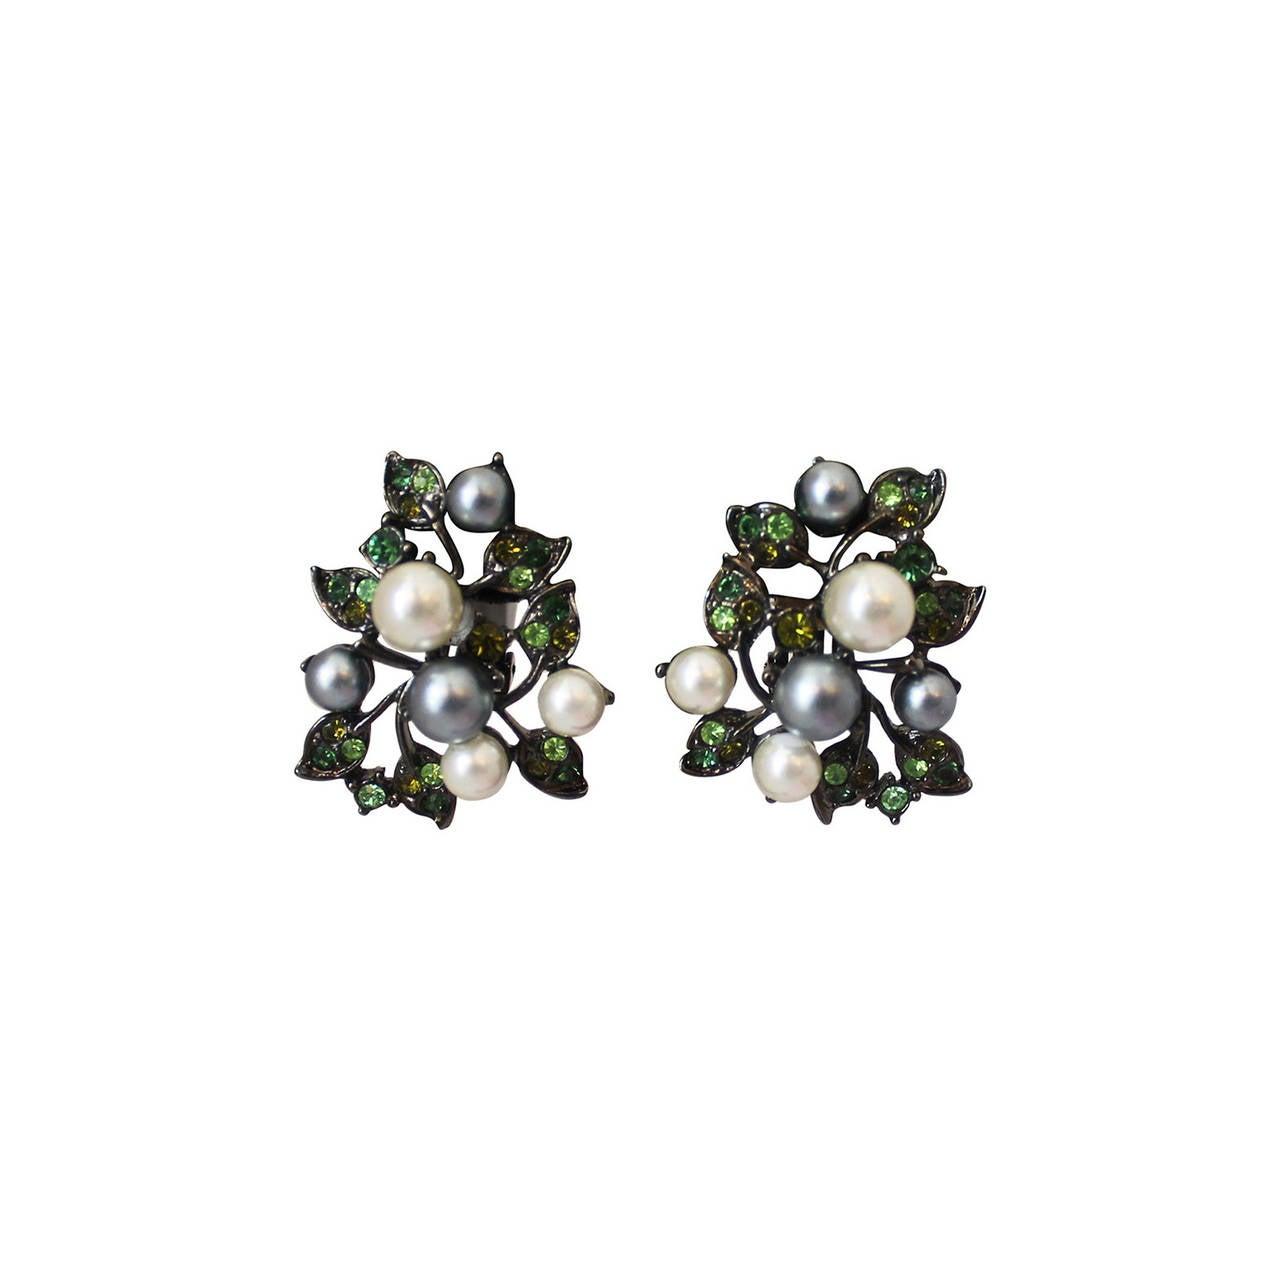 Kenneth Jay Lane 1990's Pearl & Green Rhinestone Clip-on Earrings For Sale